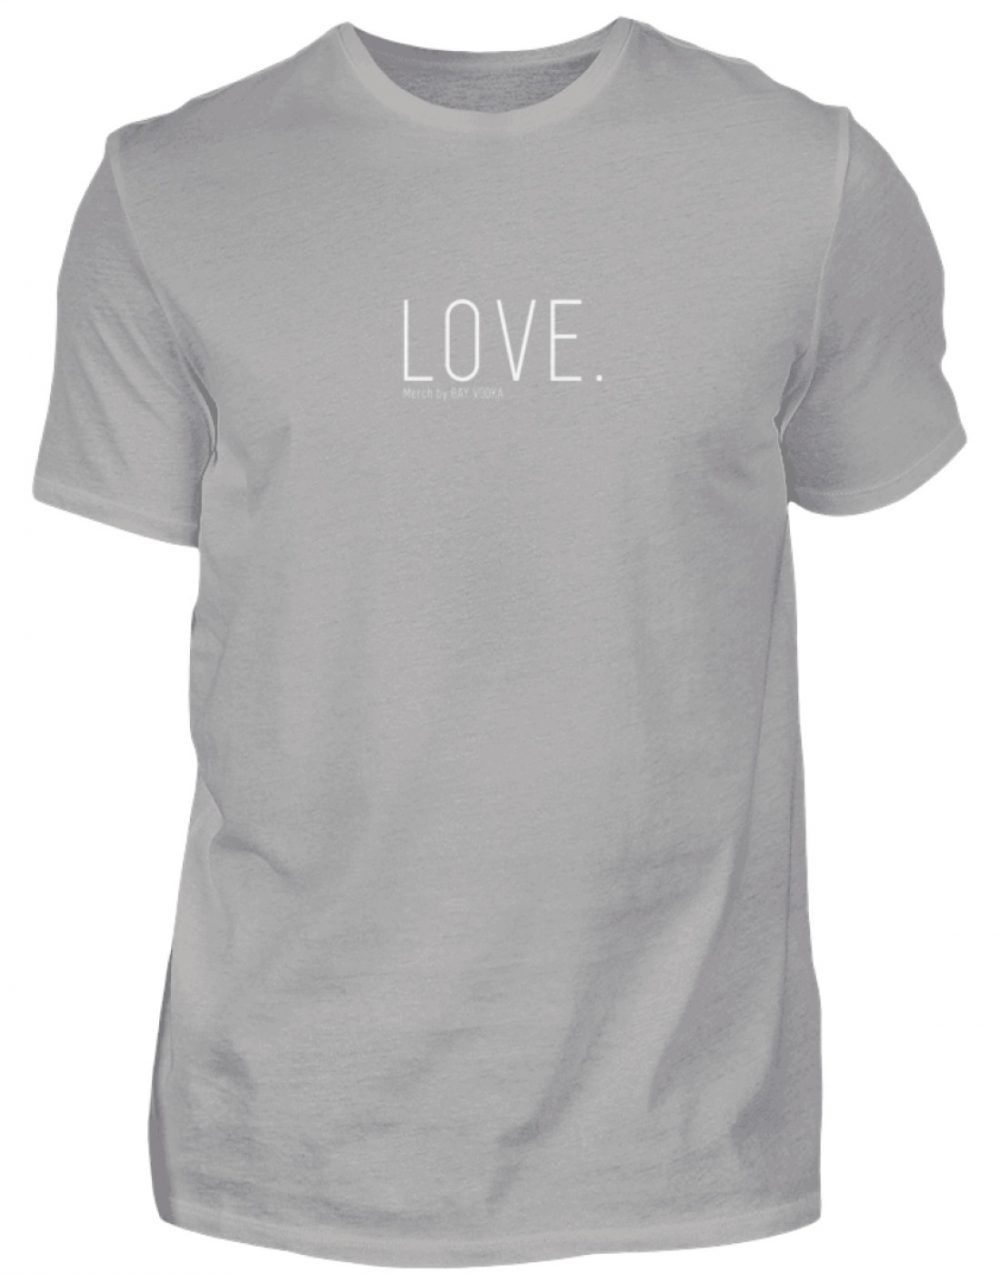 LOVE. - Herren Premiumshirt-2998